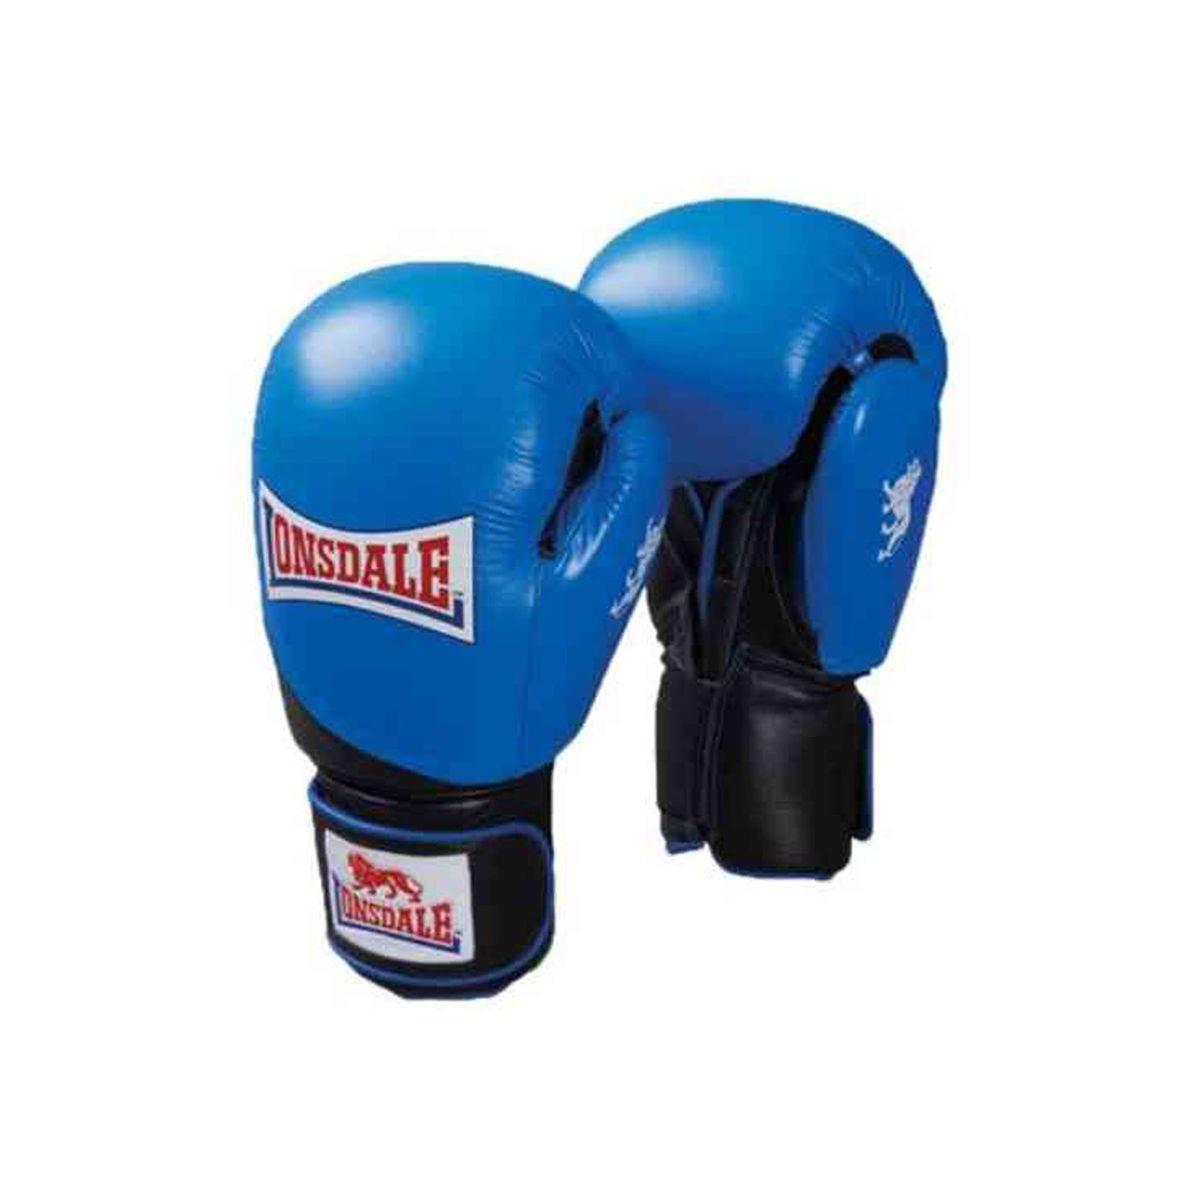 Club sparring gants de boxe en cuir